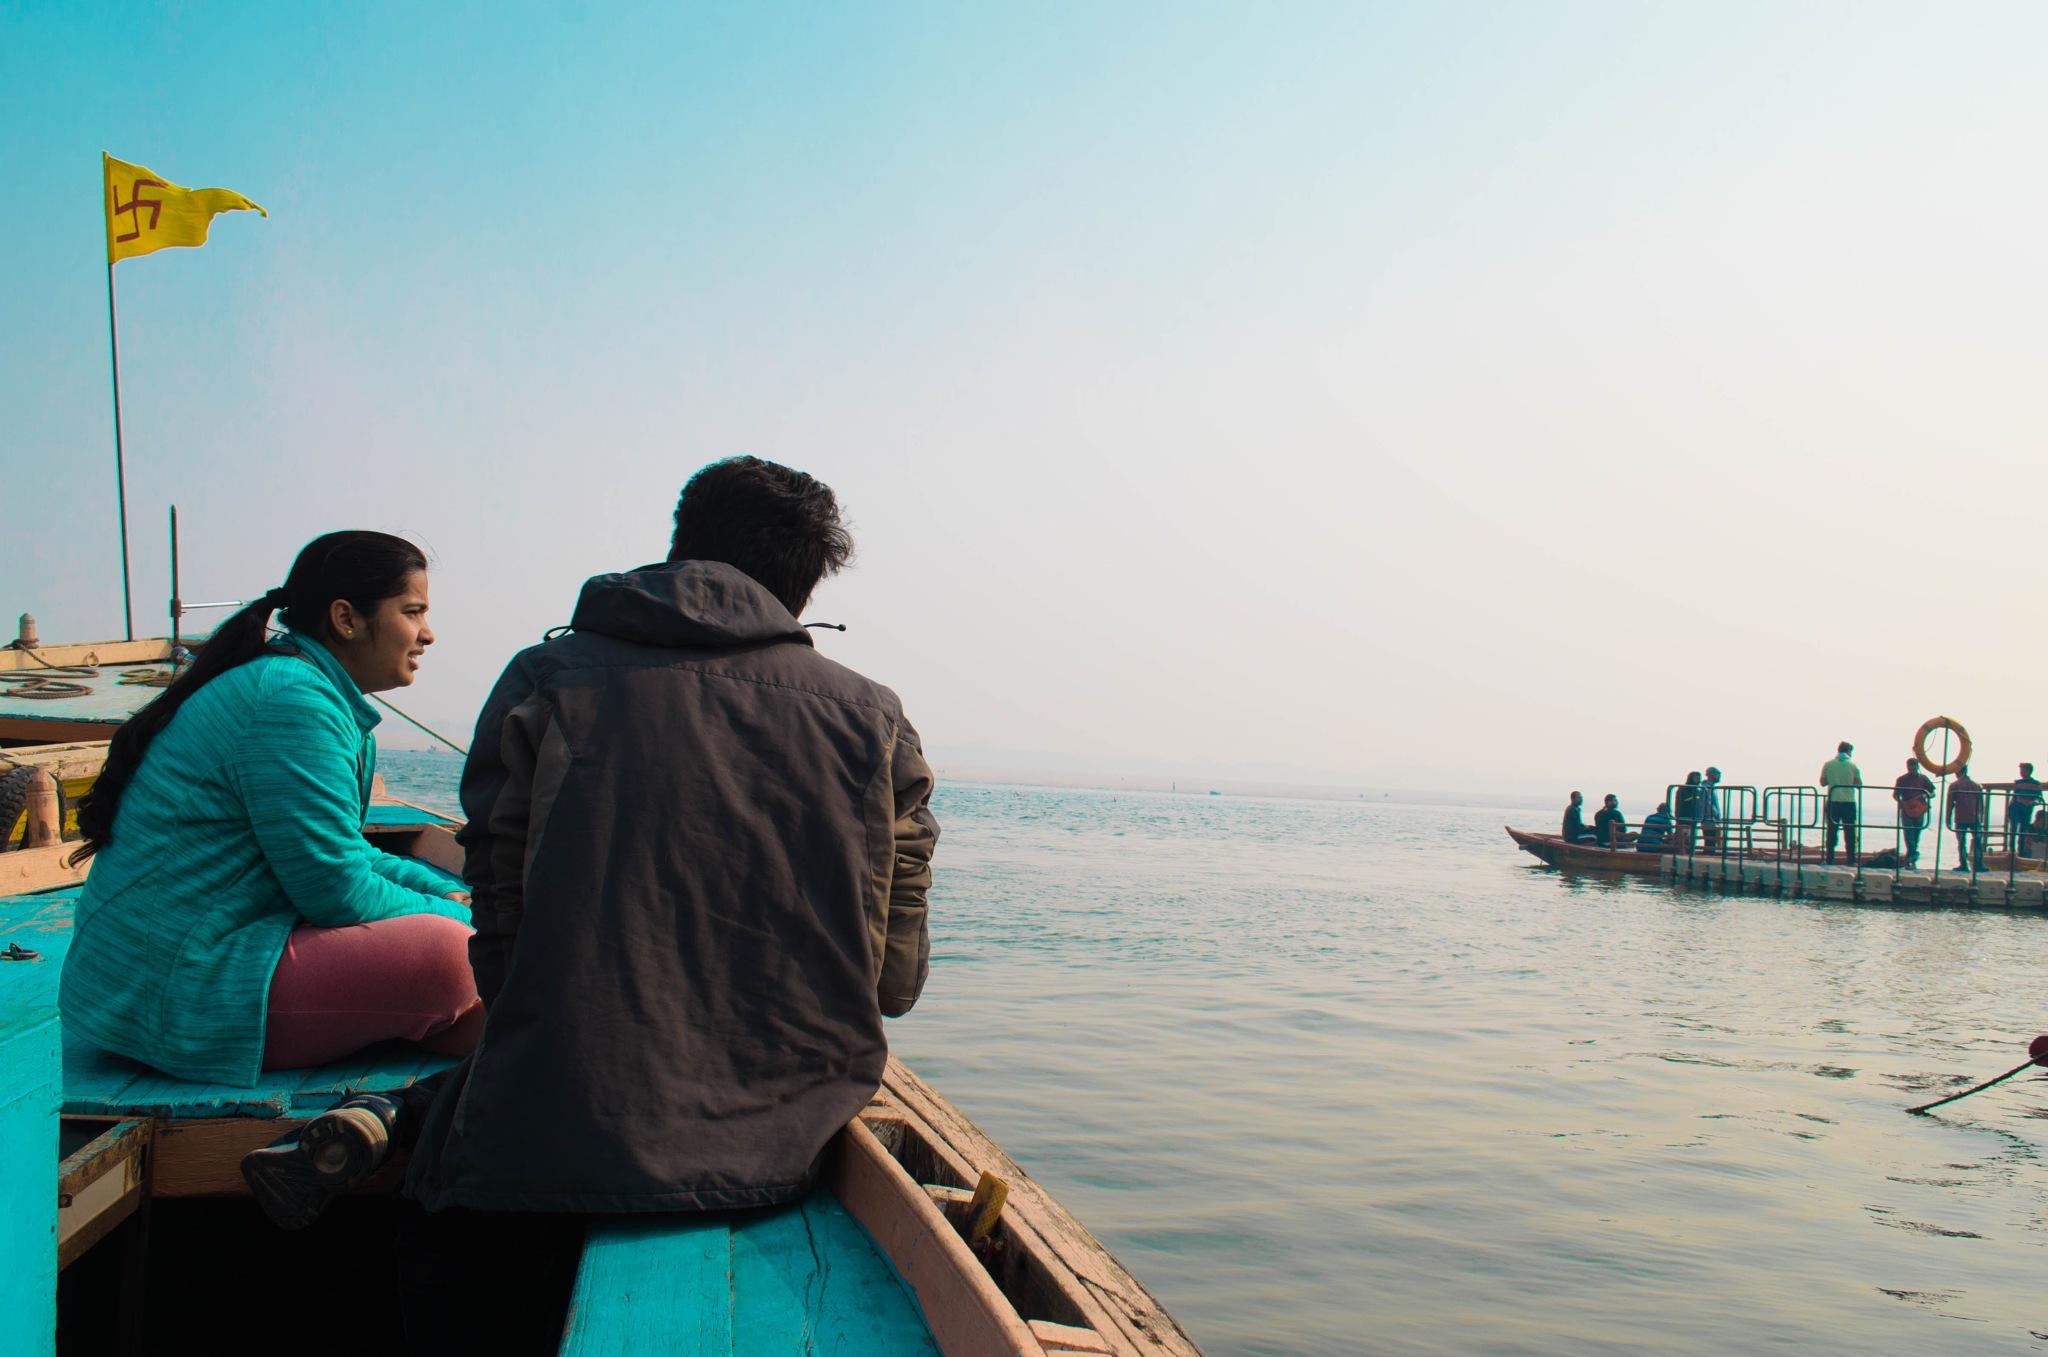 A Day in Banaras by Prateek Khatri